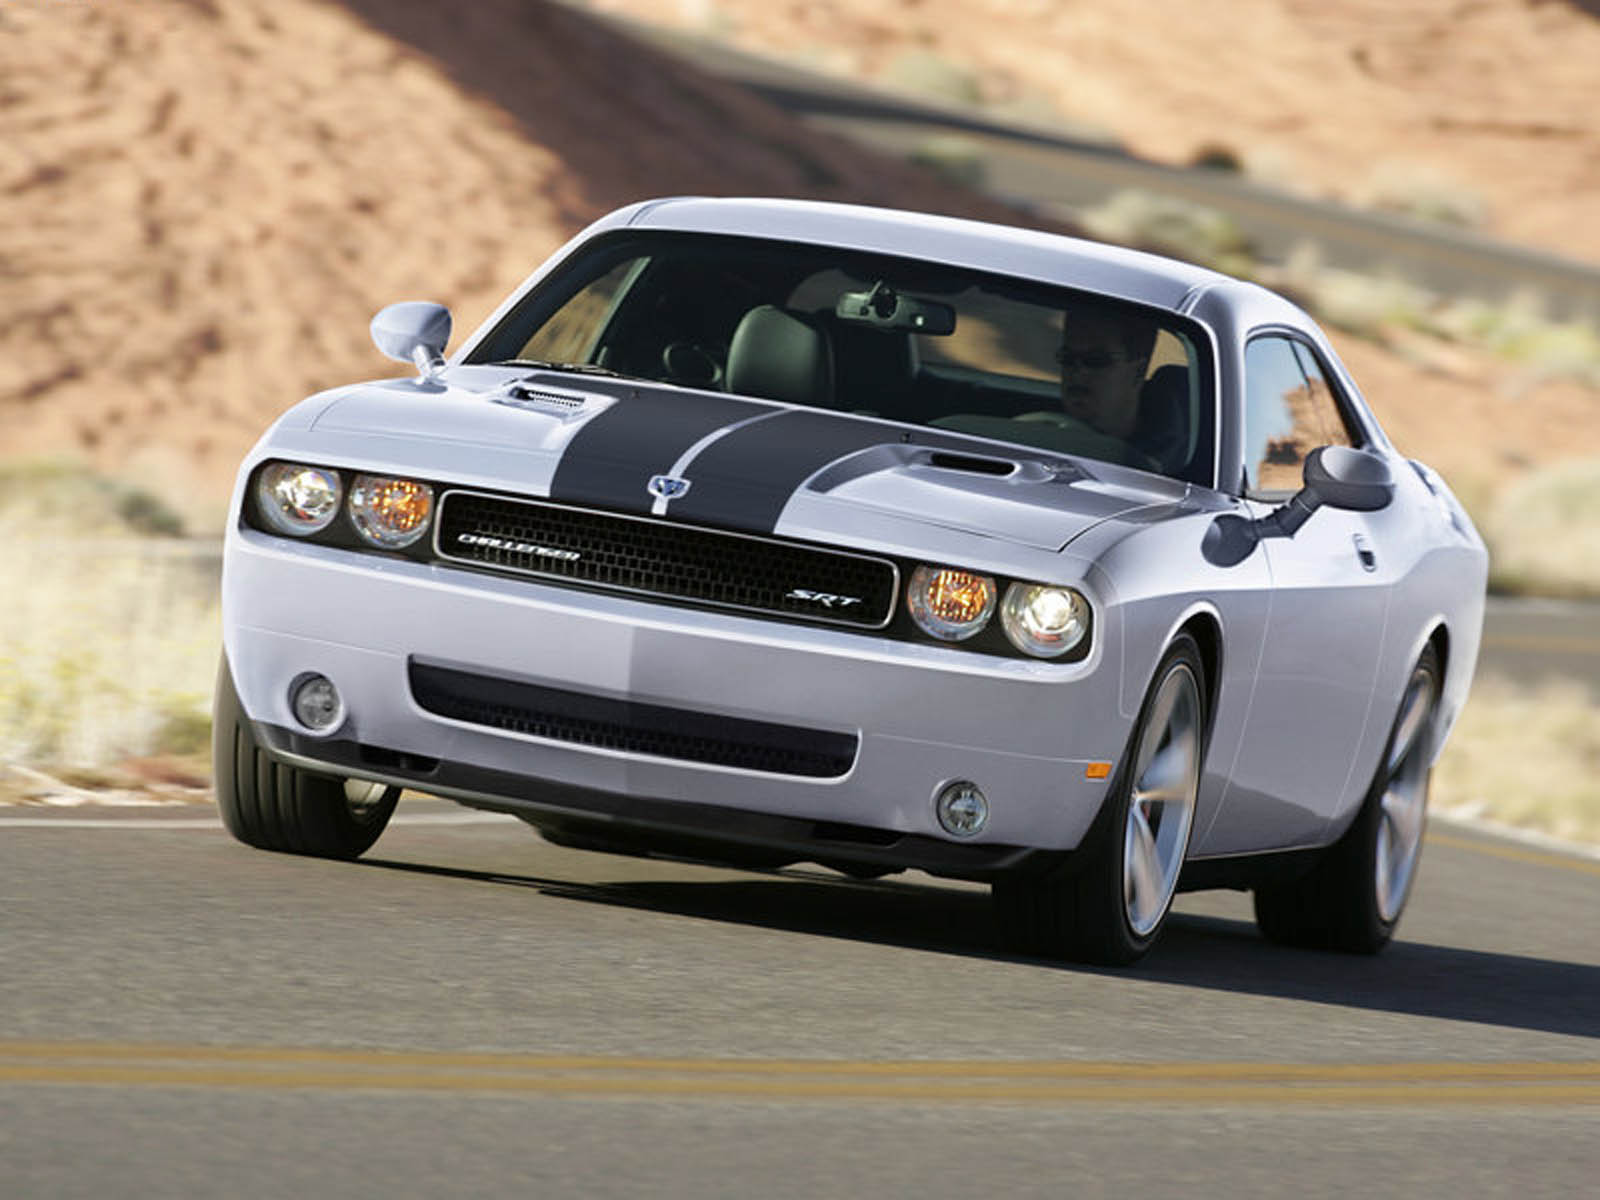 Wallpapers Dodge Challenger Srt8 Car